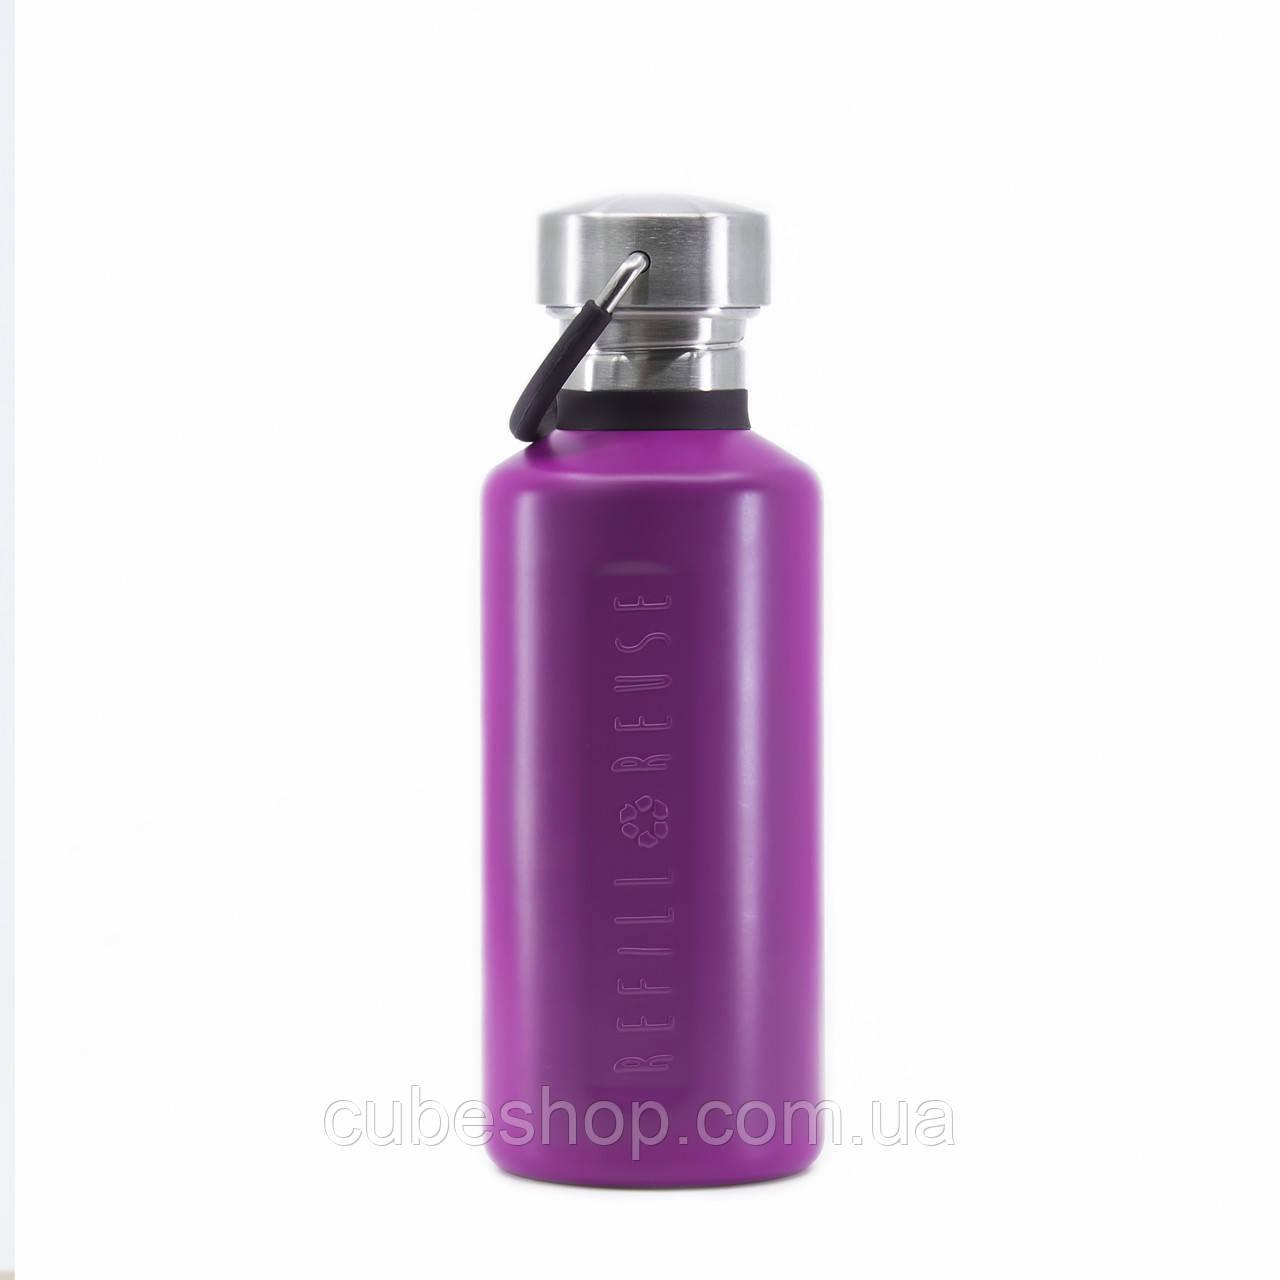 Бутылка для воды Cheeki Classic Single Wall Purple (500 мл)